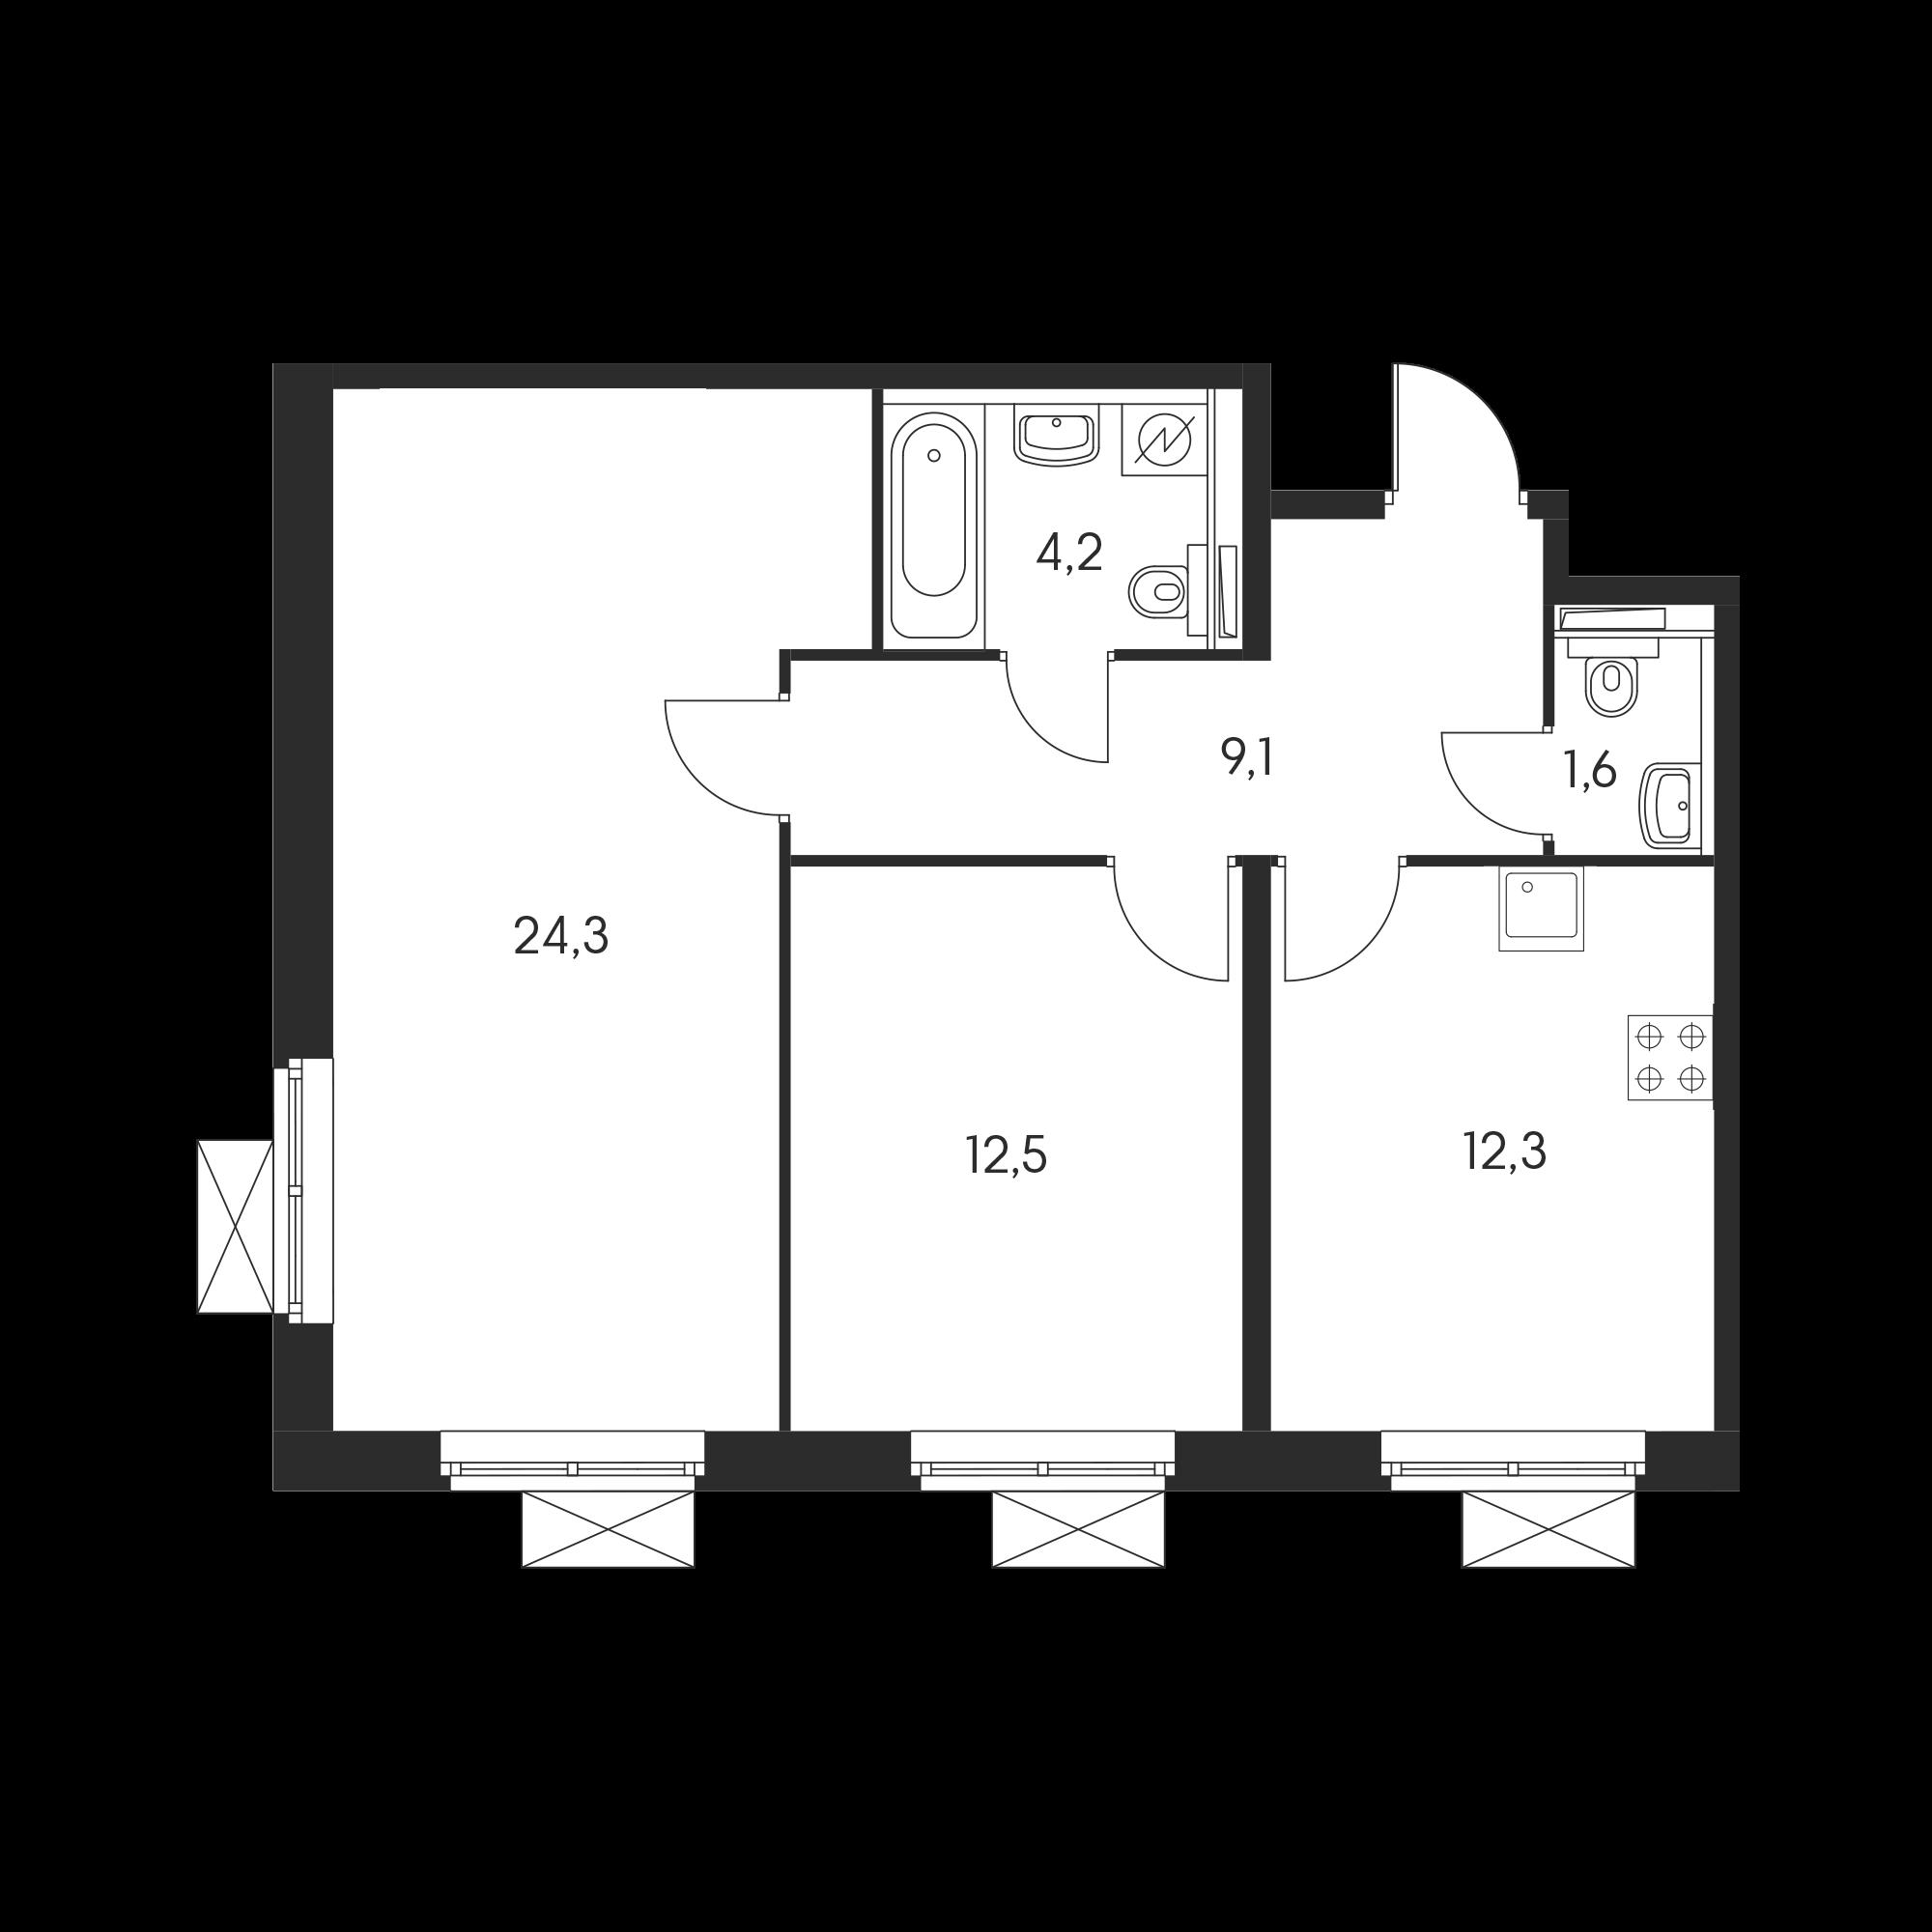 2KL4_9.9-1